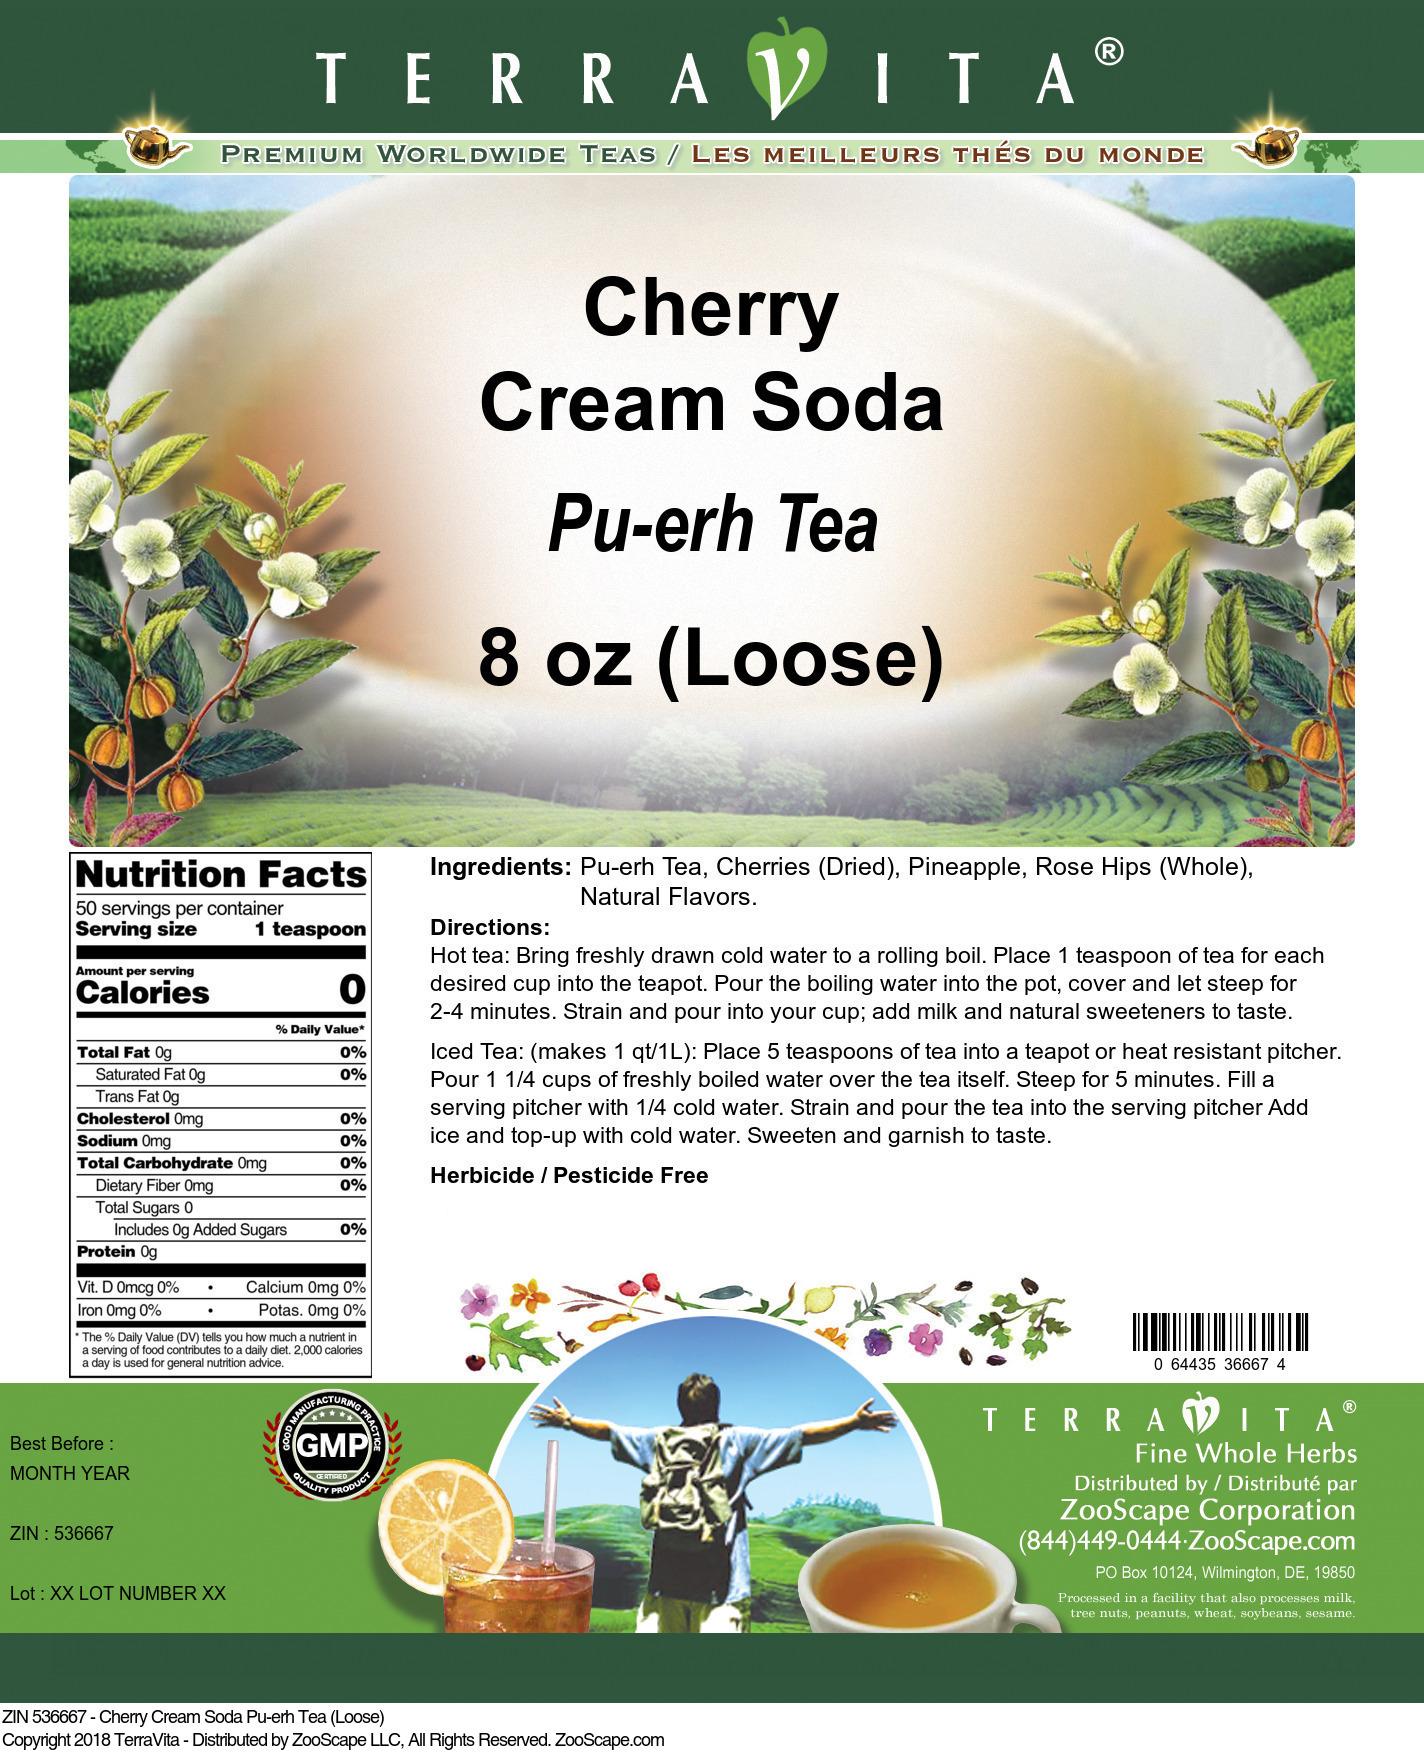 Cherry Cream Soda Pu-erh Tea (Loose)